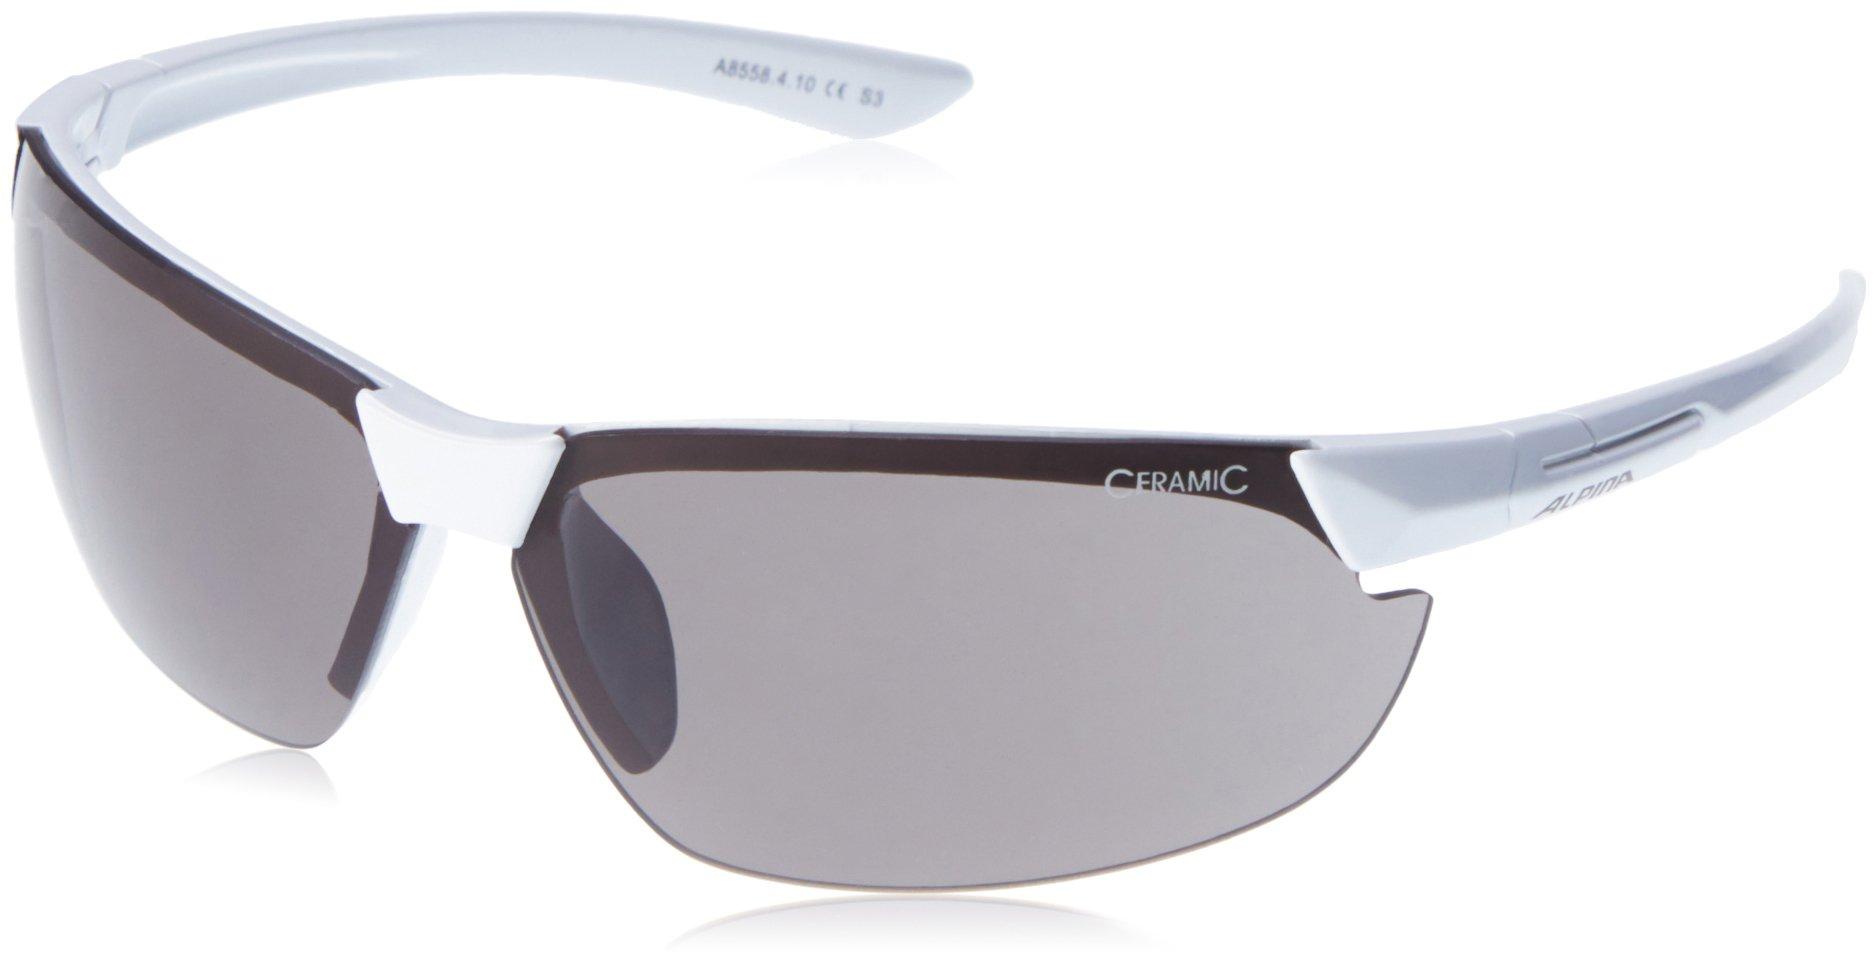 Alpina Sonnenbrille Amition Draff, White, One Size